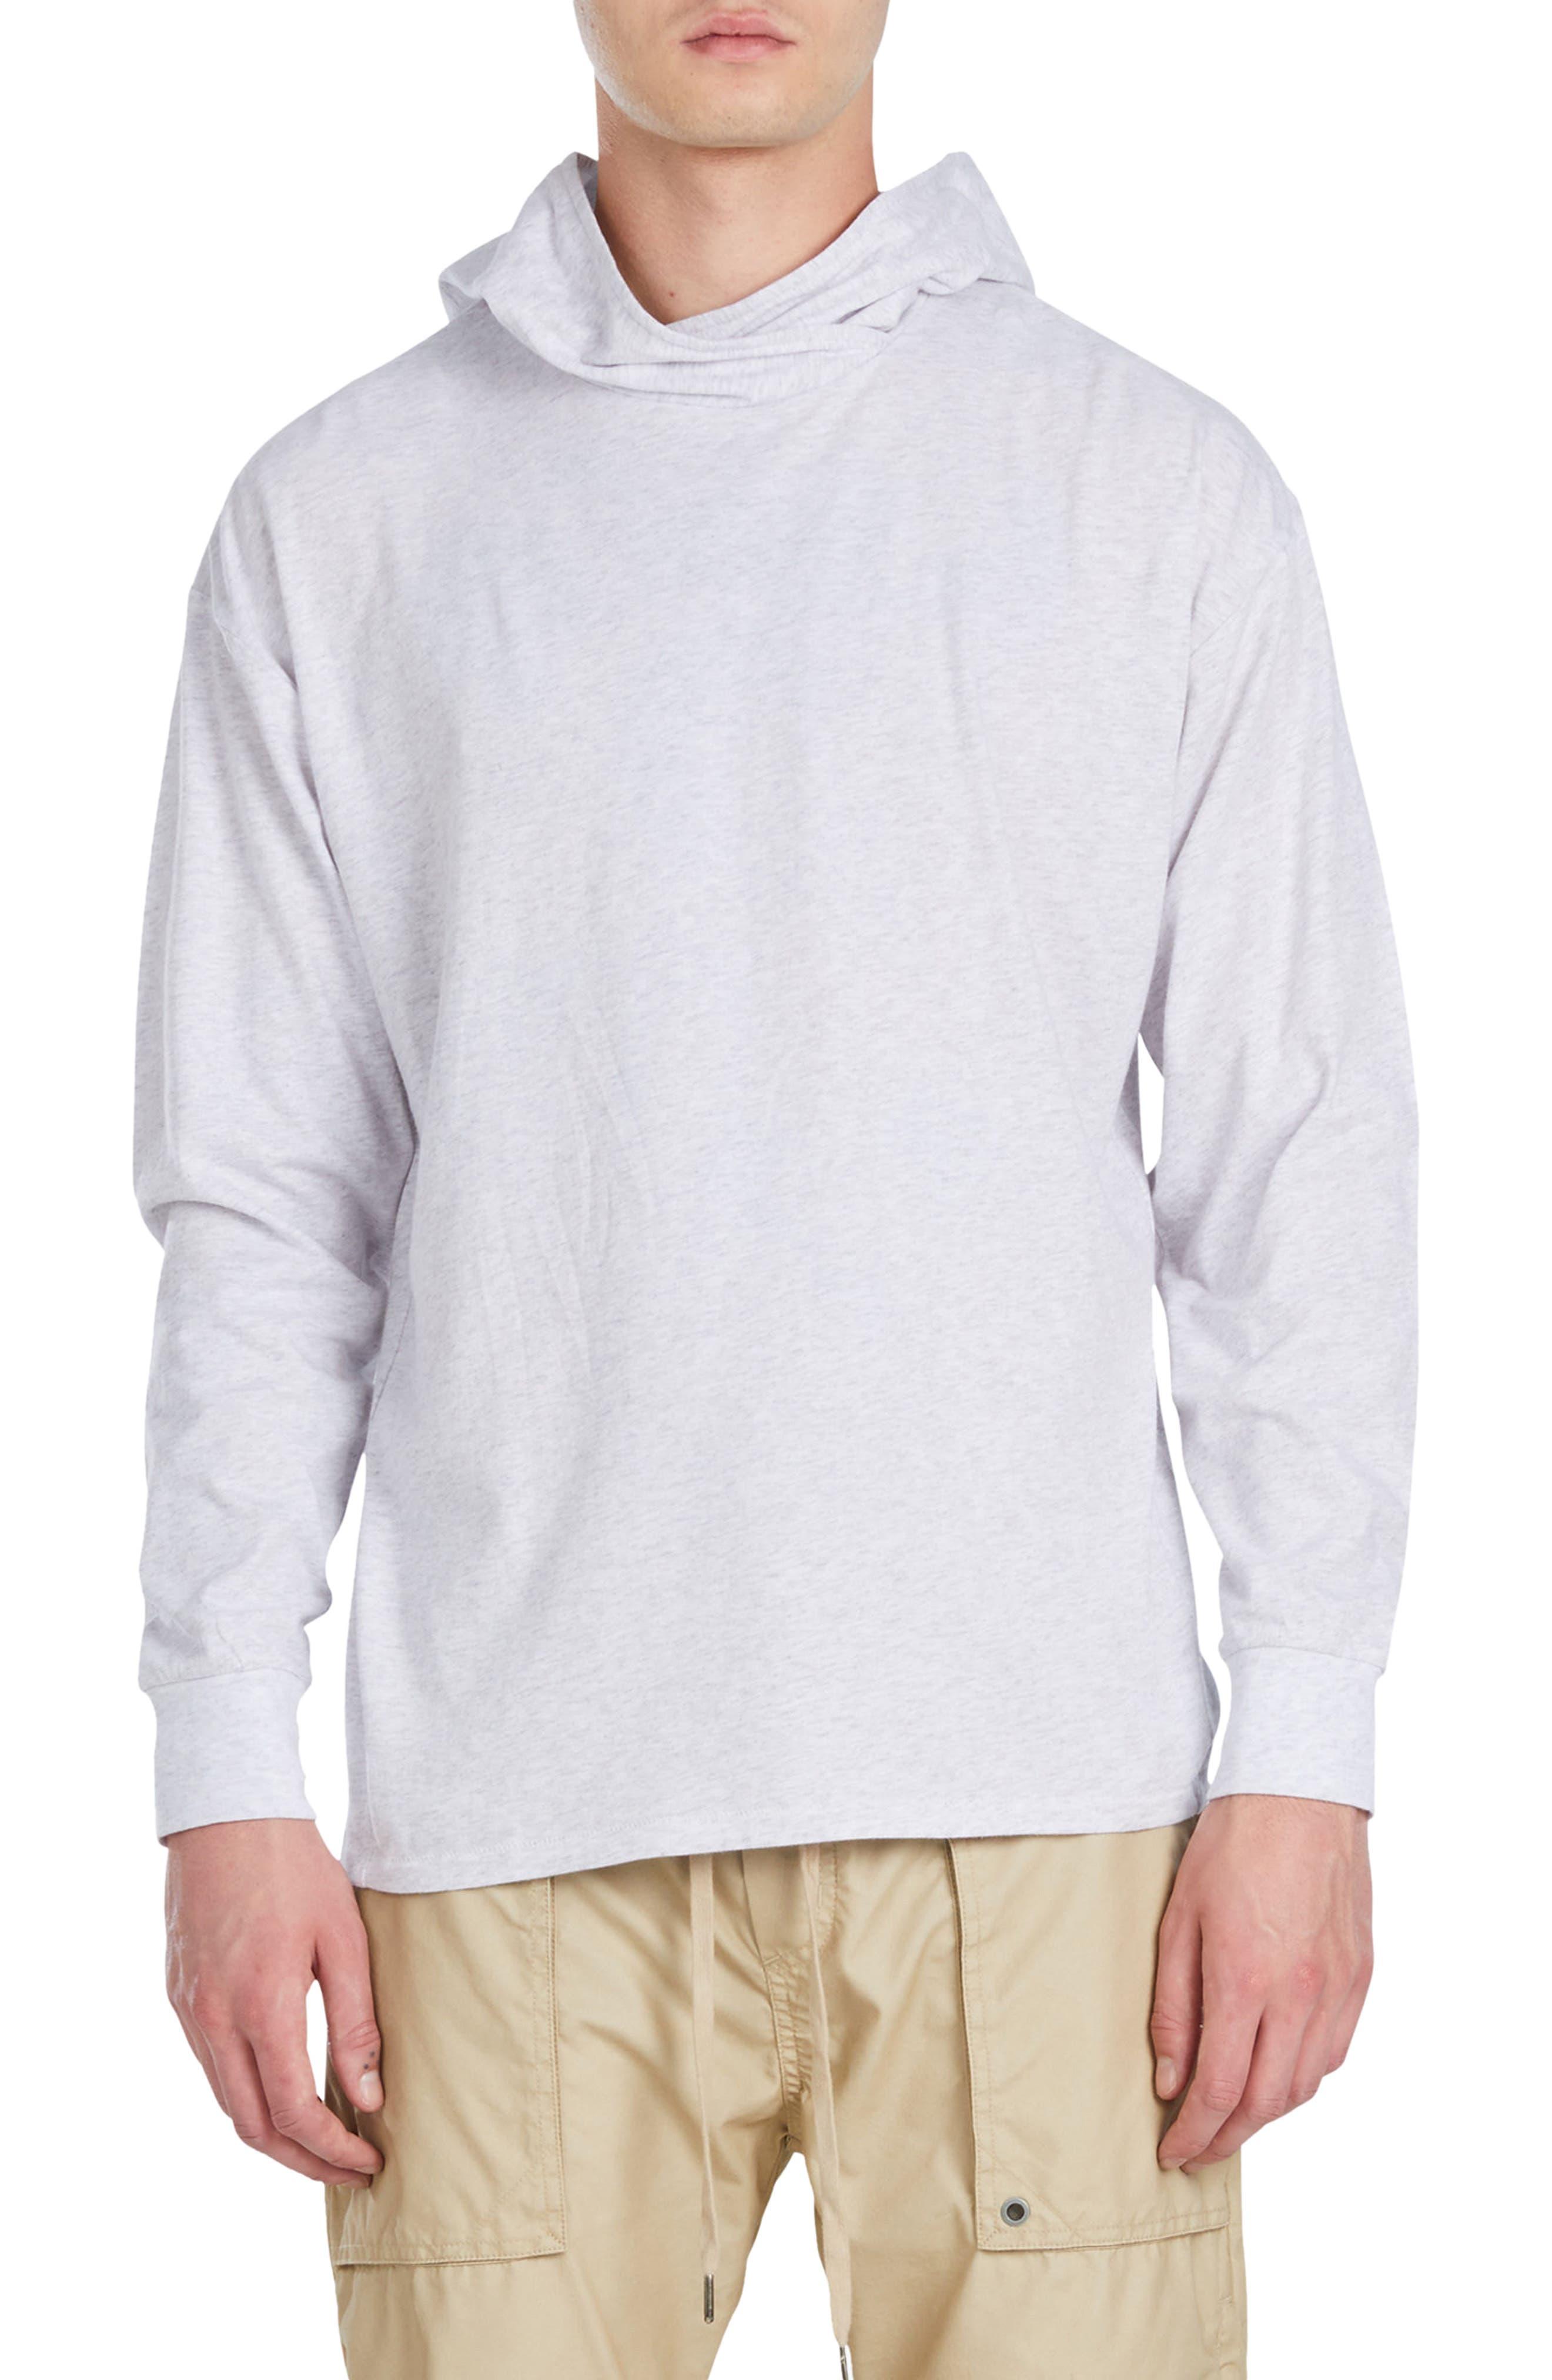 Rugger Long Sleeve Hooded T-Shirt,                         Main,                         color, Bleach Marled